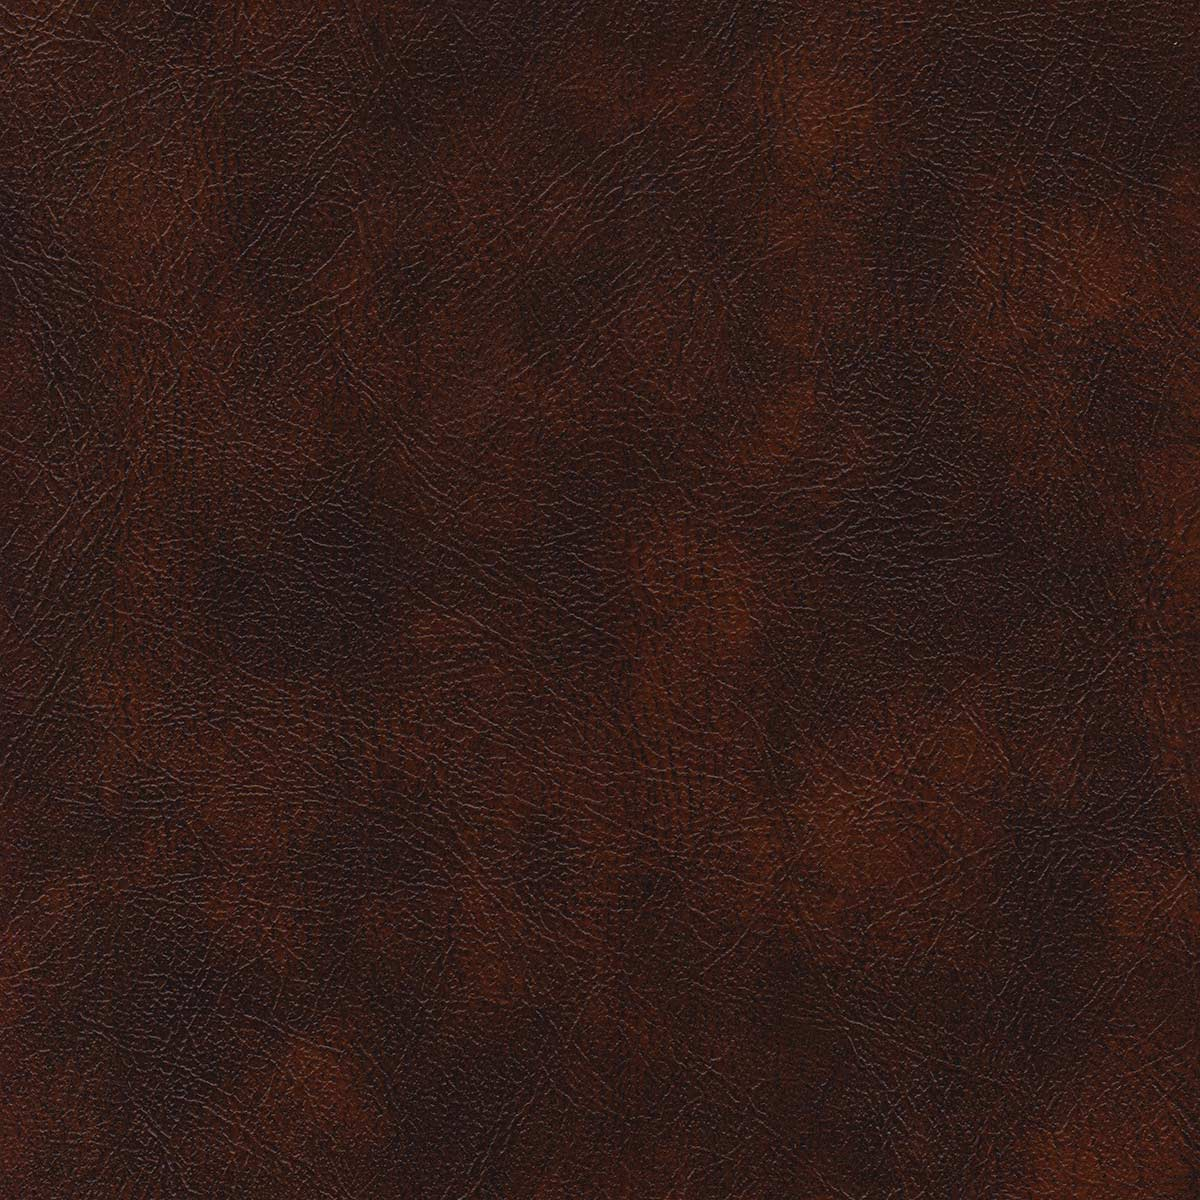 Coated panel PVC code PS-46